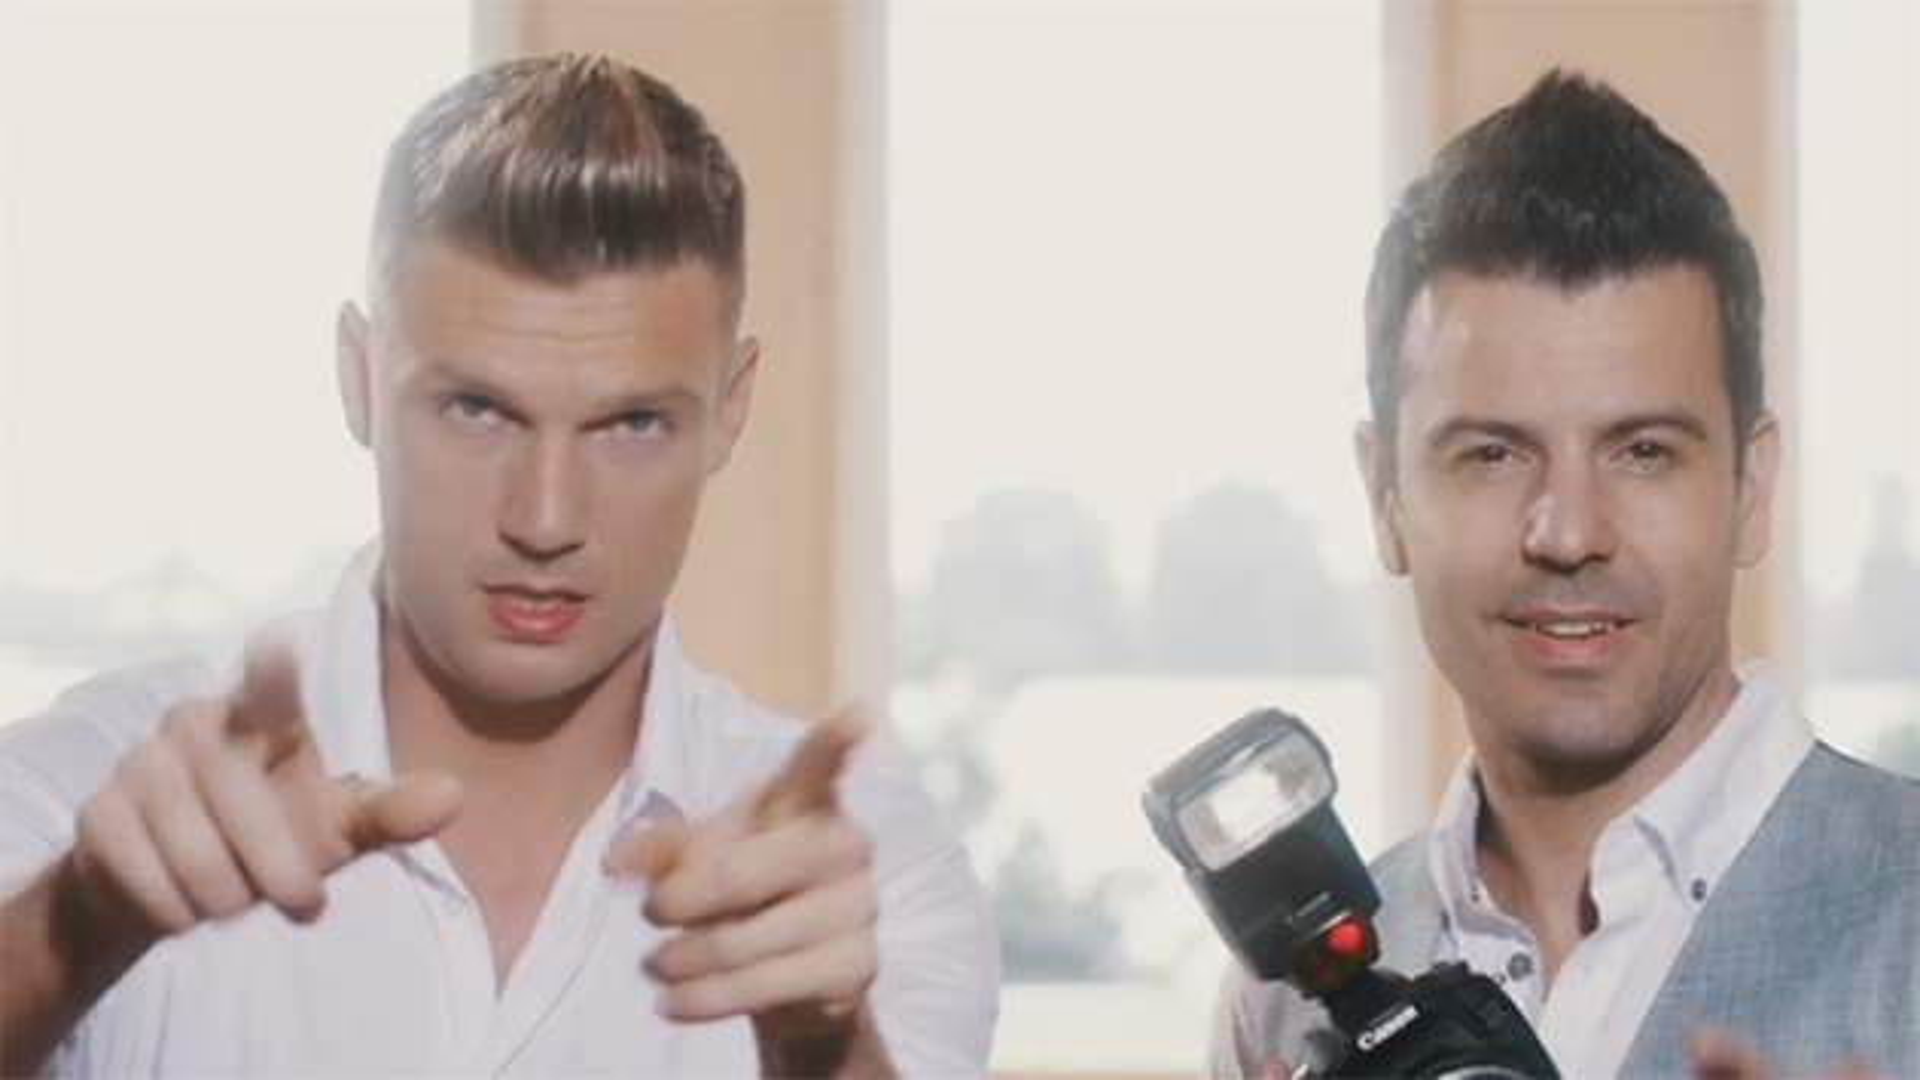 Nick-Knight-One-More-Time-Musikvideo-Nick-Carter-Jordan-Knight